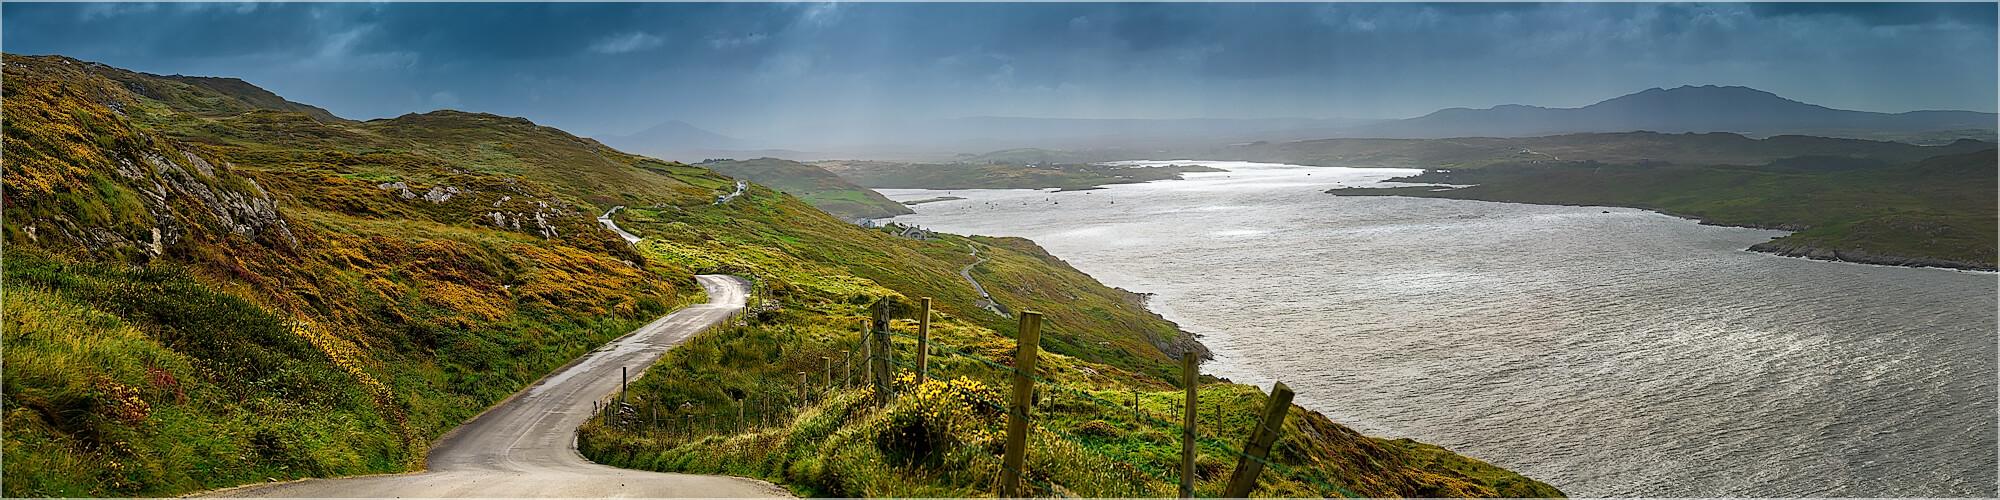 Panoramabild Irland Wild Atlantik Way